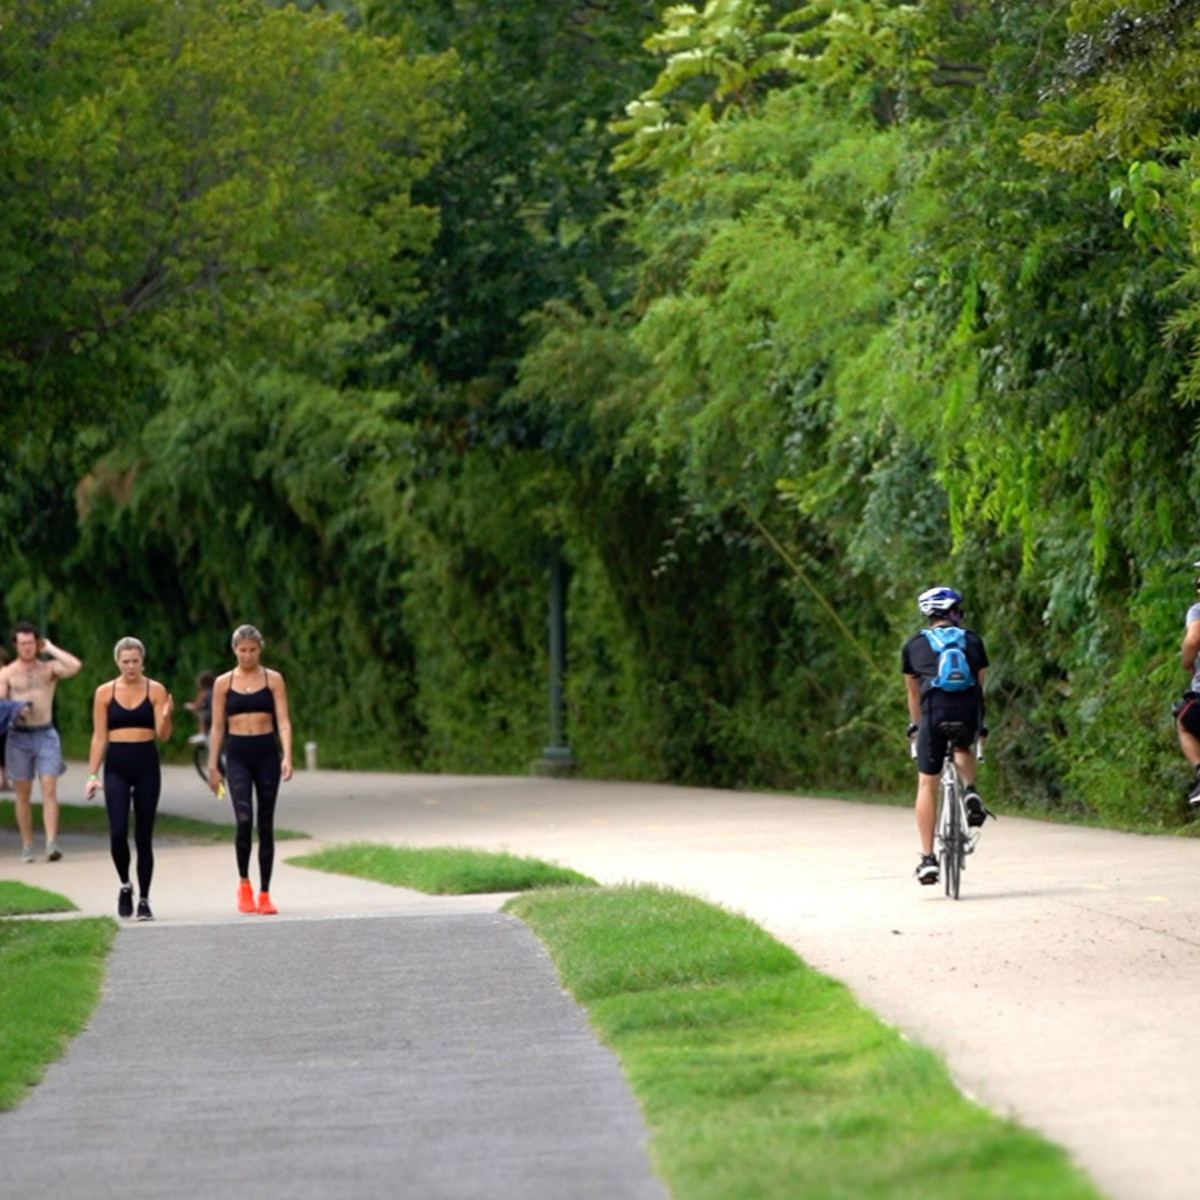 Riding bikes jogging Katy Trail